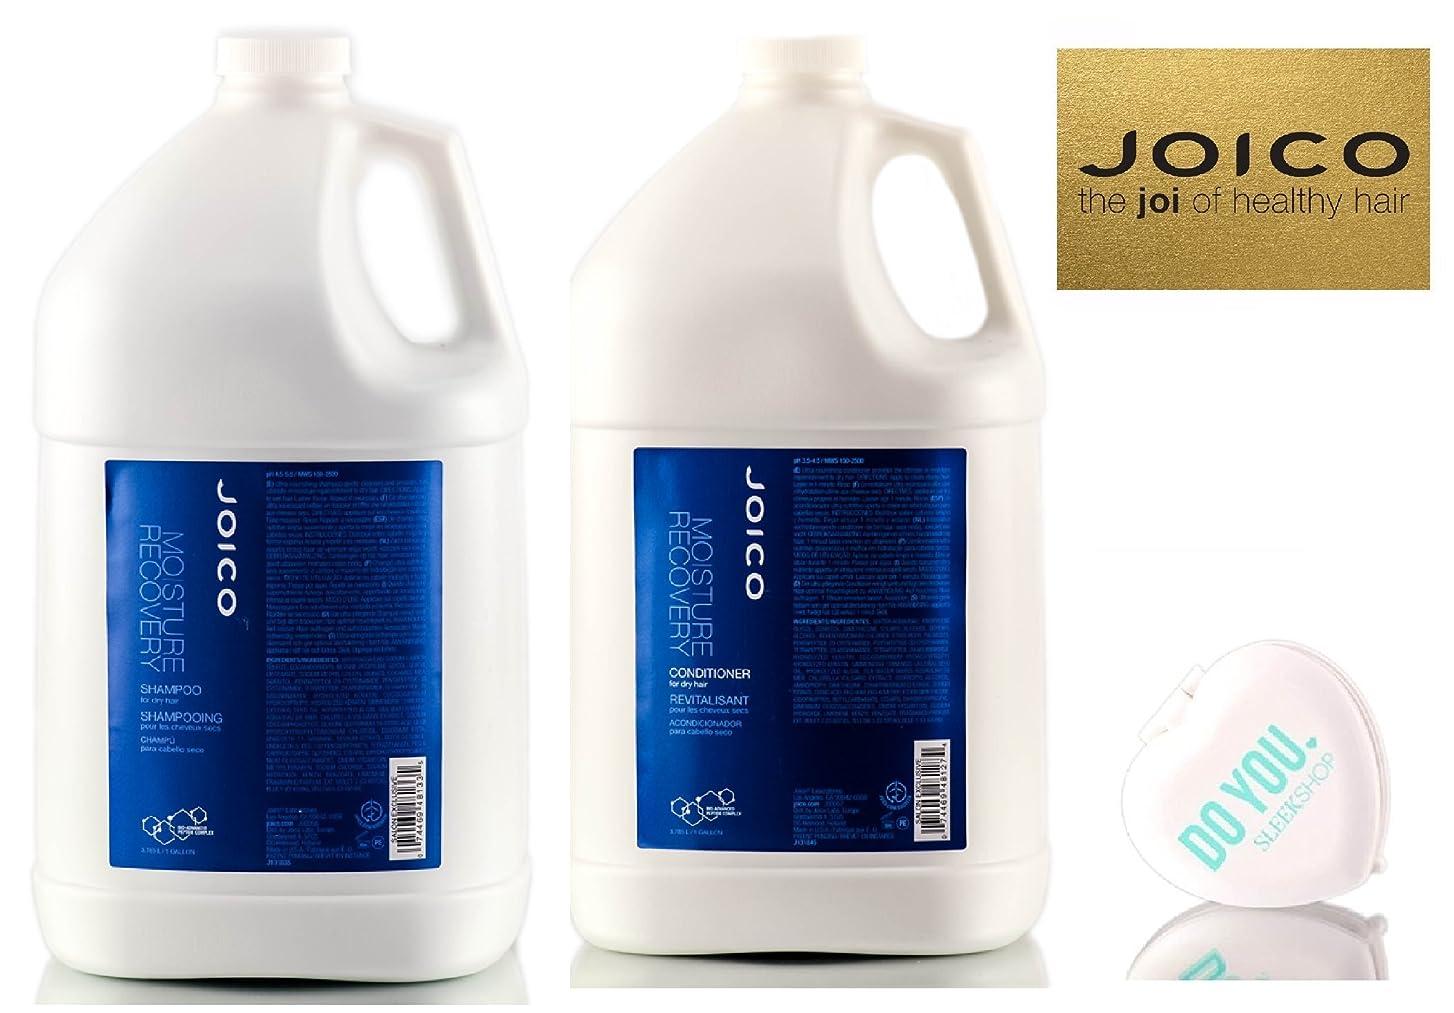 Moisture Recovery by Joico (なめらかなコンパクトミラー付)ドライヘアデュオセットのためジョイコモイスチャーリカバリーシャンプー&コンディショナー 128オンス/ 1ガロンプロフェッショナルデュオキット